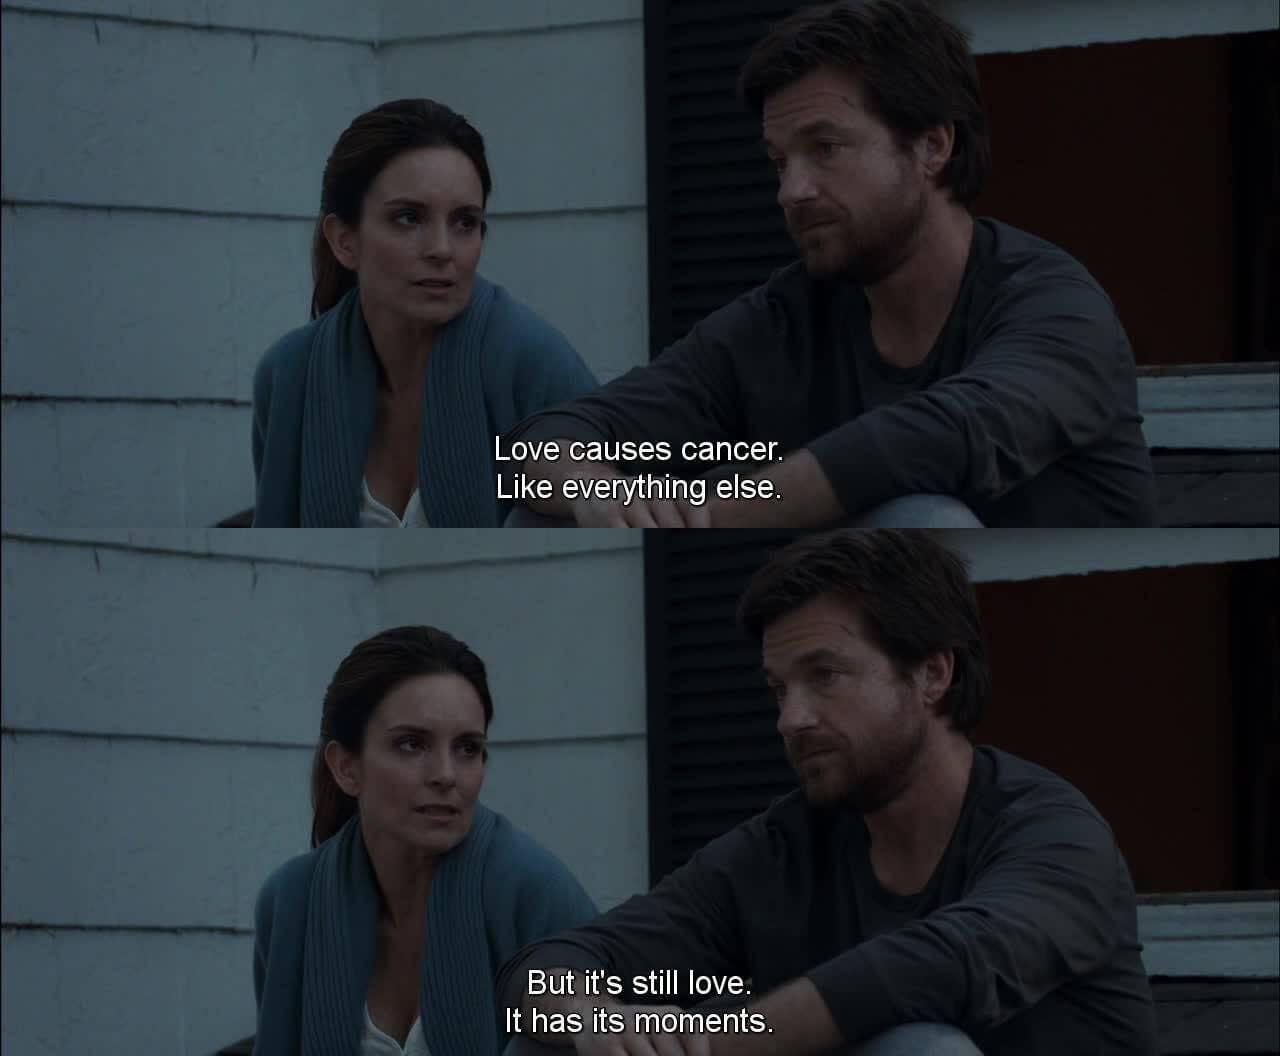 Movie Quote - Memorable Scenes 5